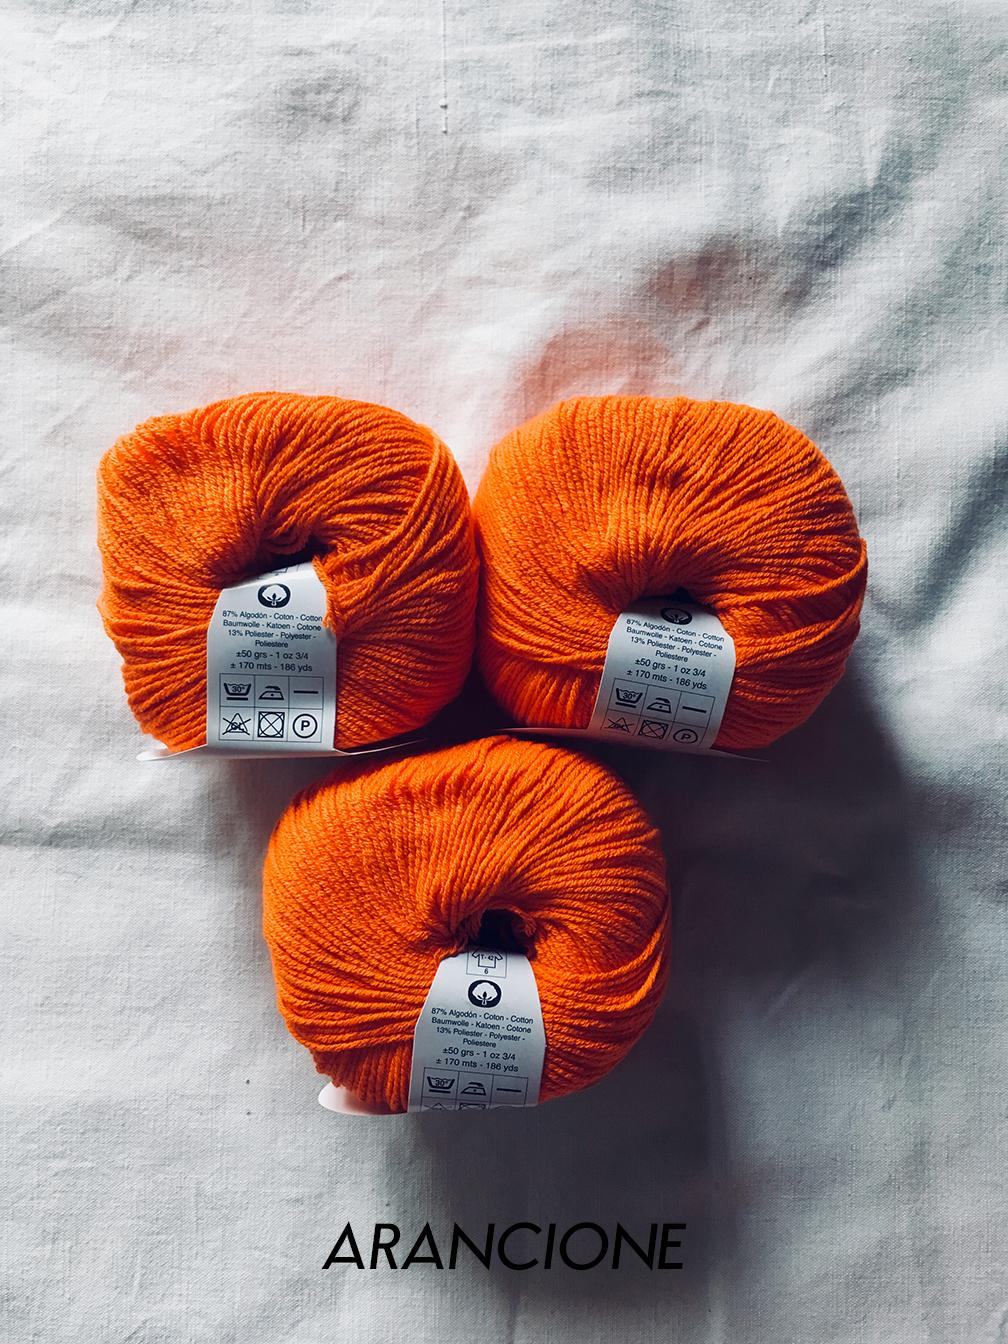 katia_cotton_stretch_arancione_16_wool_done_knitting.jpg